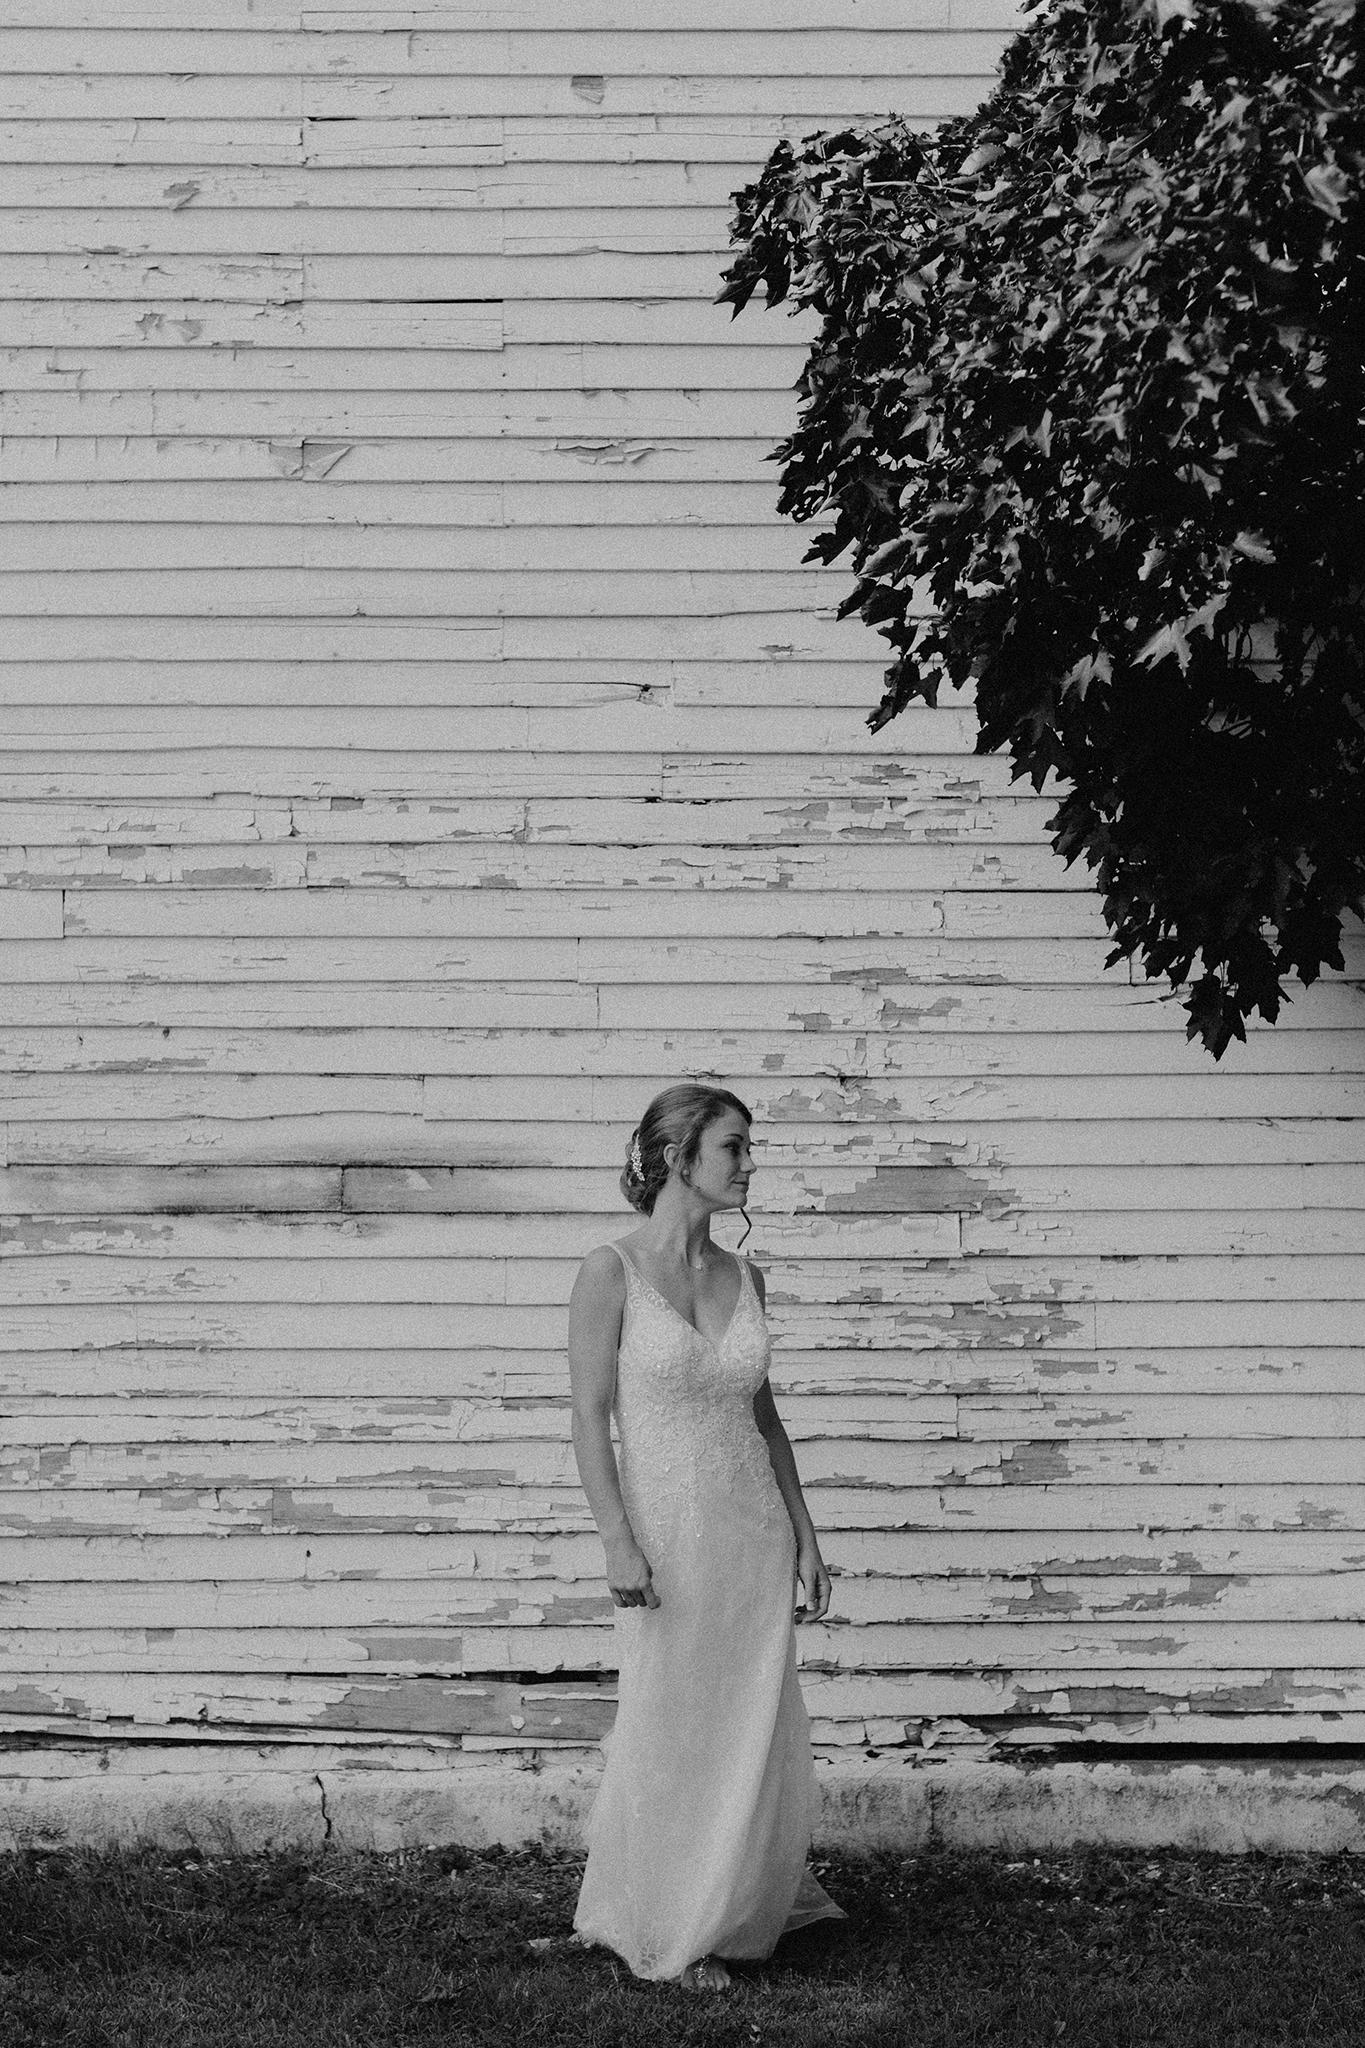 vermont-wedding-photographer-outdoor-farm-wedding-57.jpg